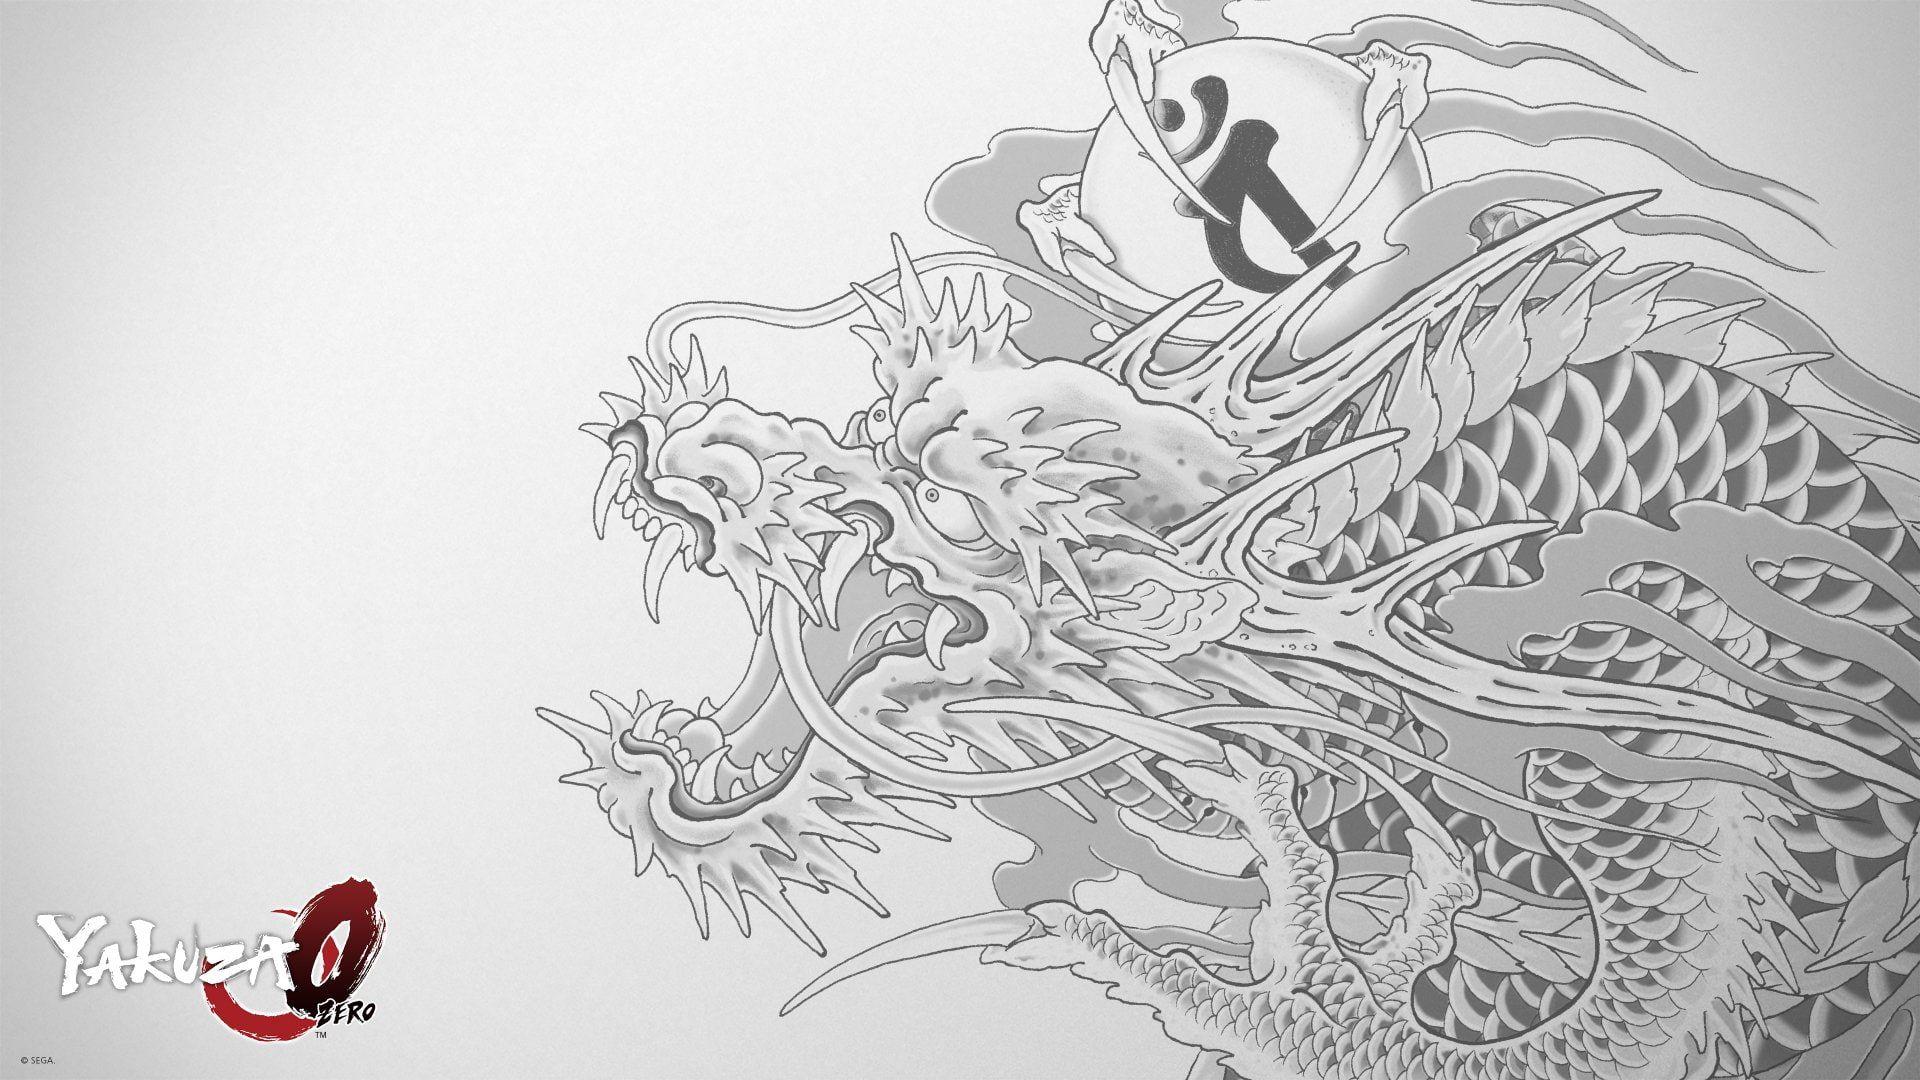 Video Game Yakuza 0 Dragon Tattoo 1080p Wallpaper Hdwallpaper Desktop In 2021 Doodle Art Flowers Hd Wallpaper Doodle Art Journals Yakuza tattoo design wallpaper